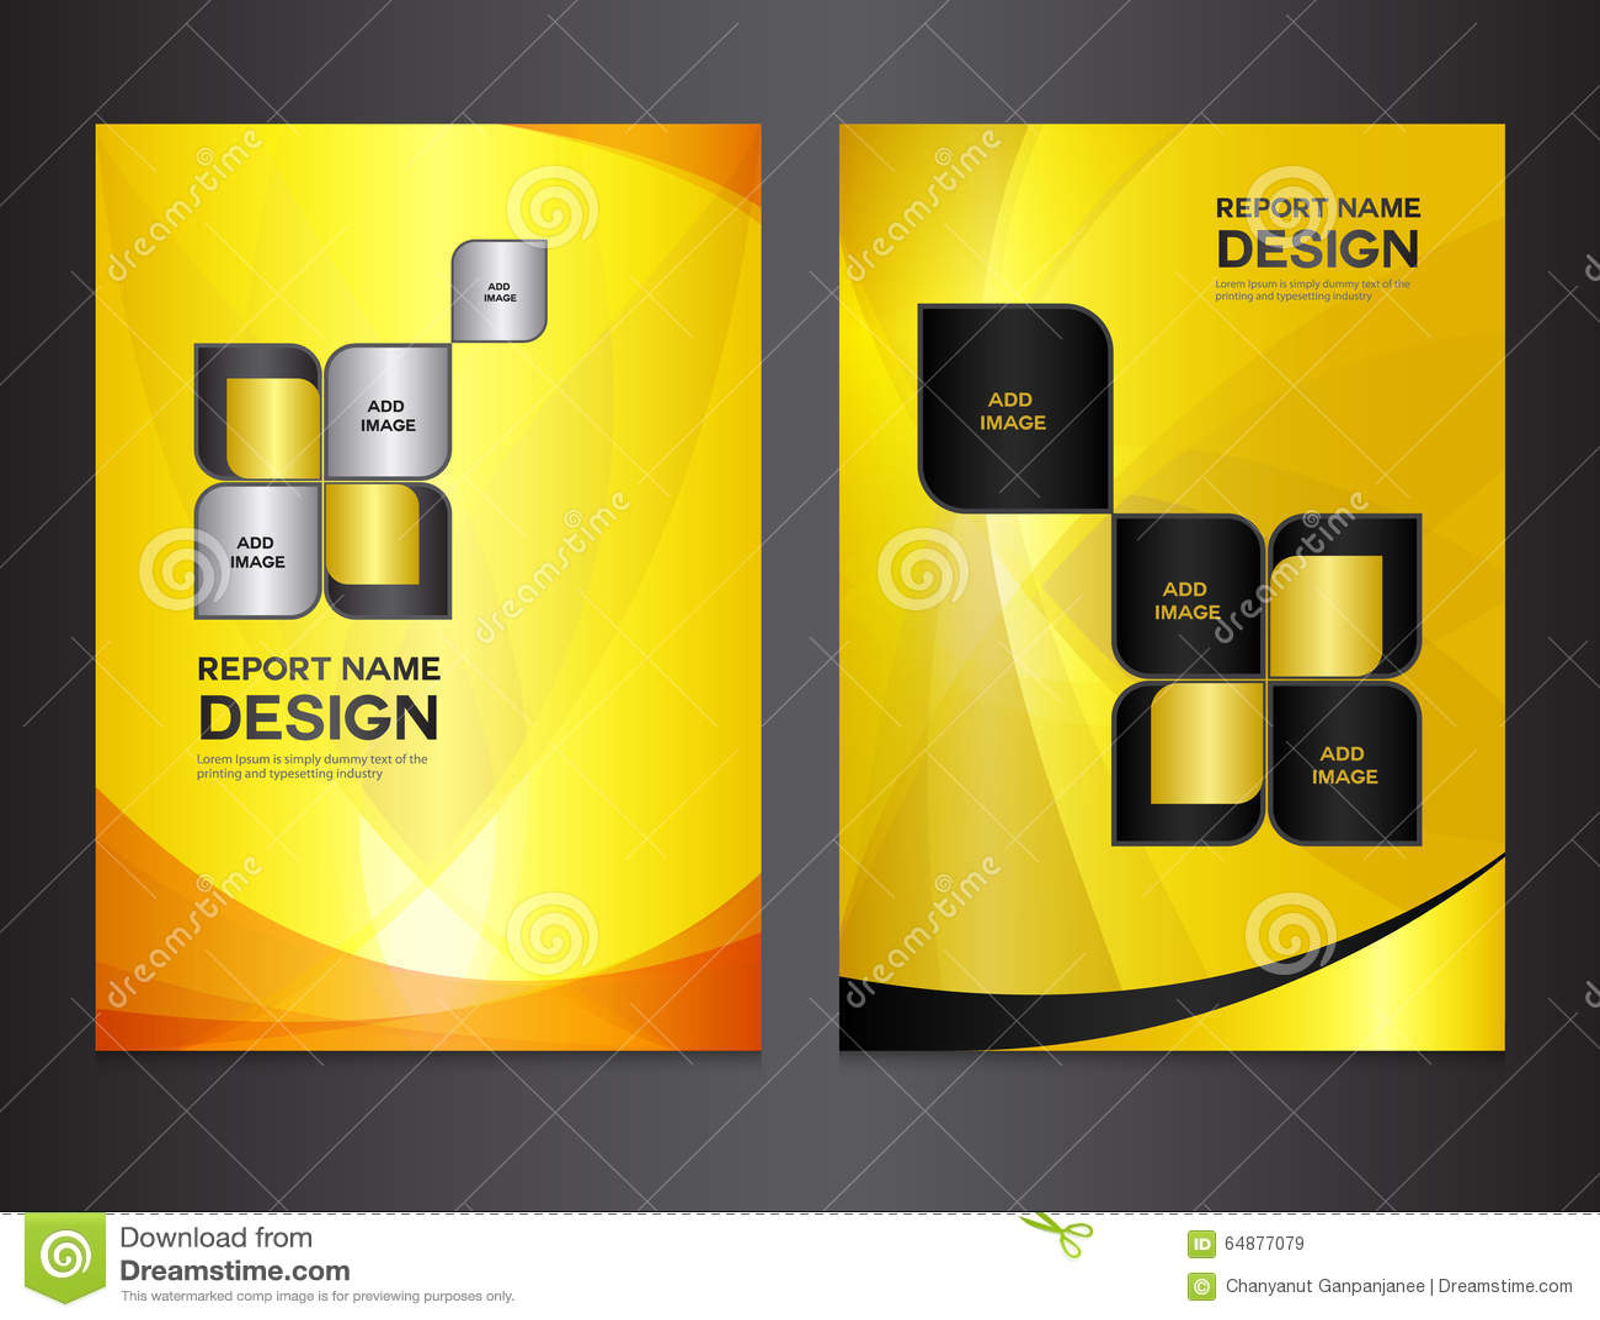 set yellow cover templates design stock vector image  set yellow cover templates design